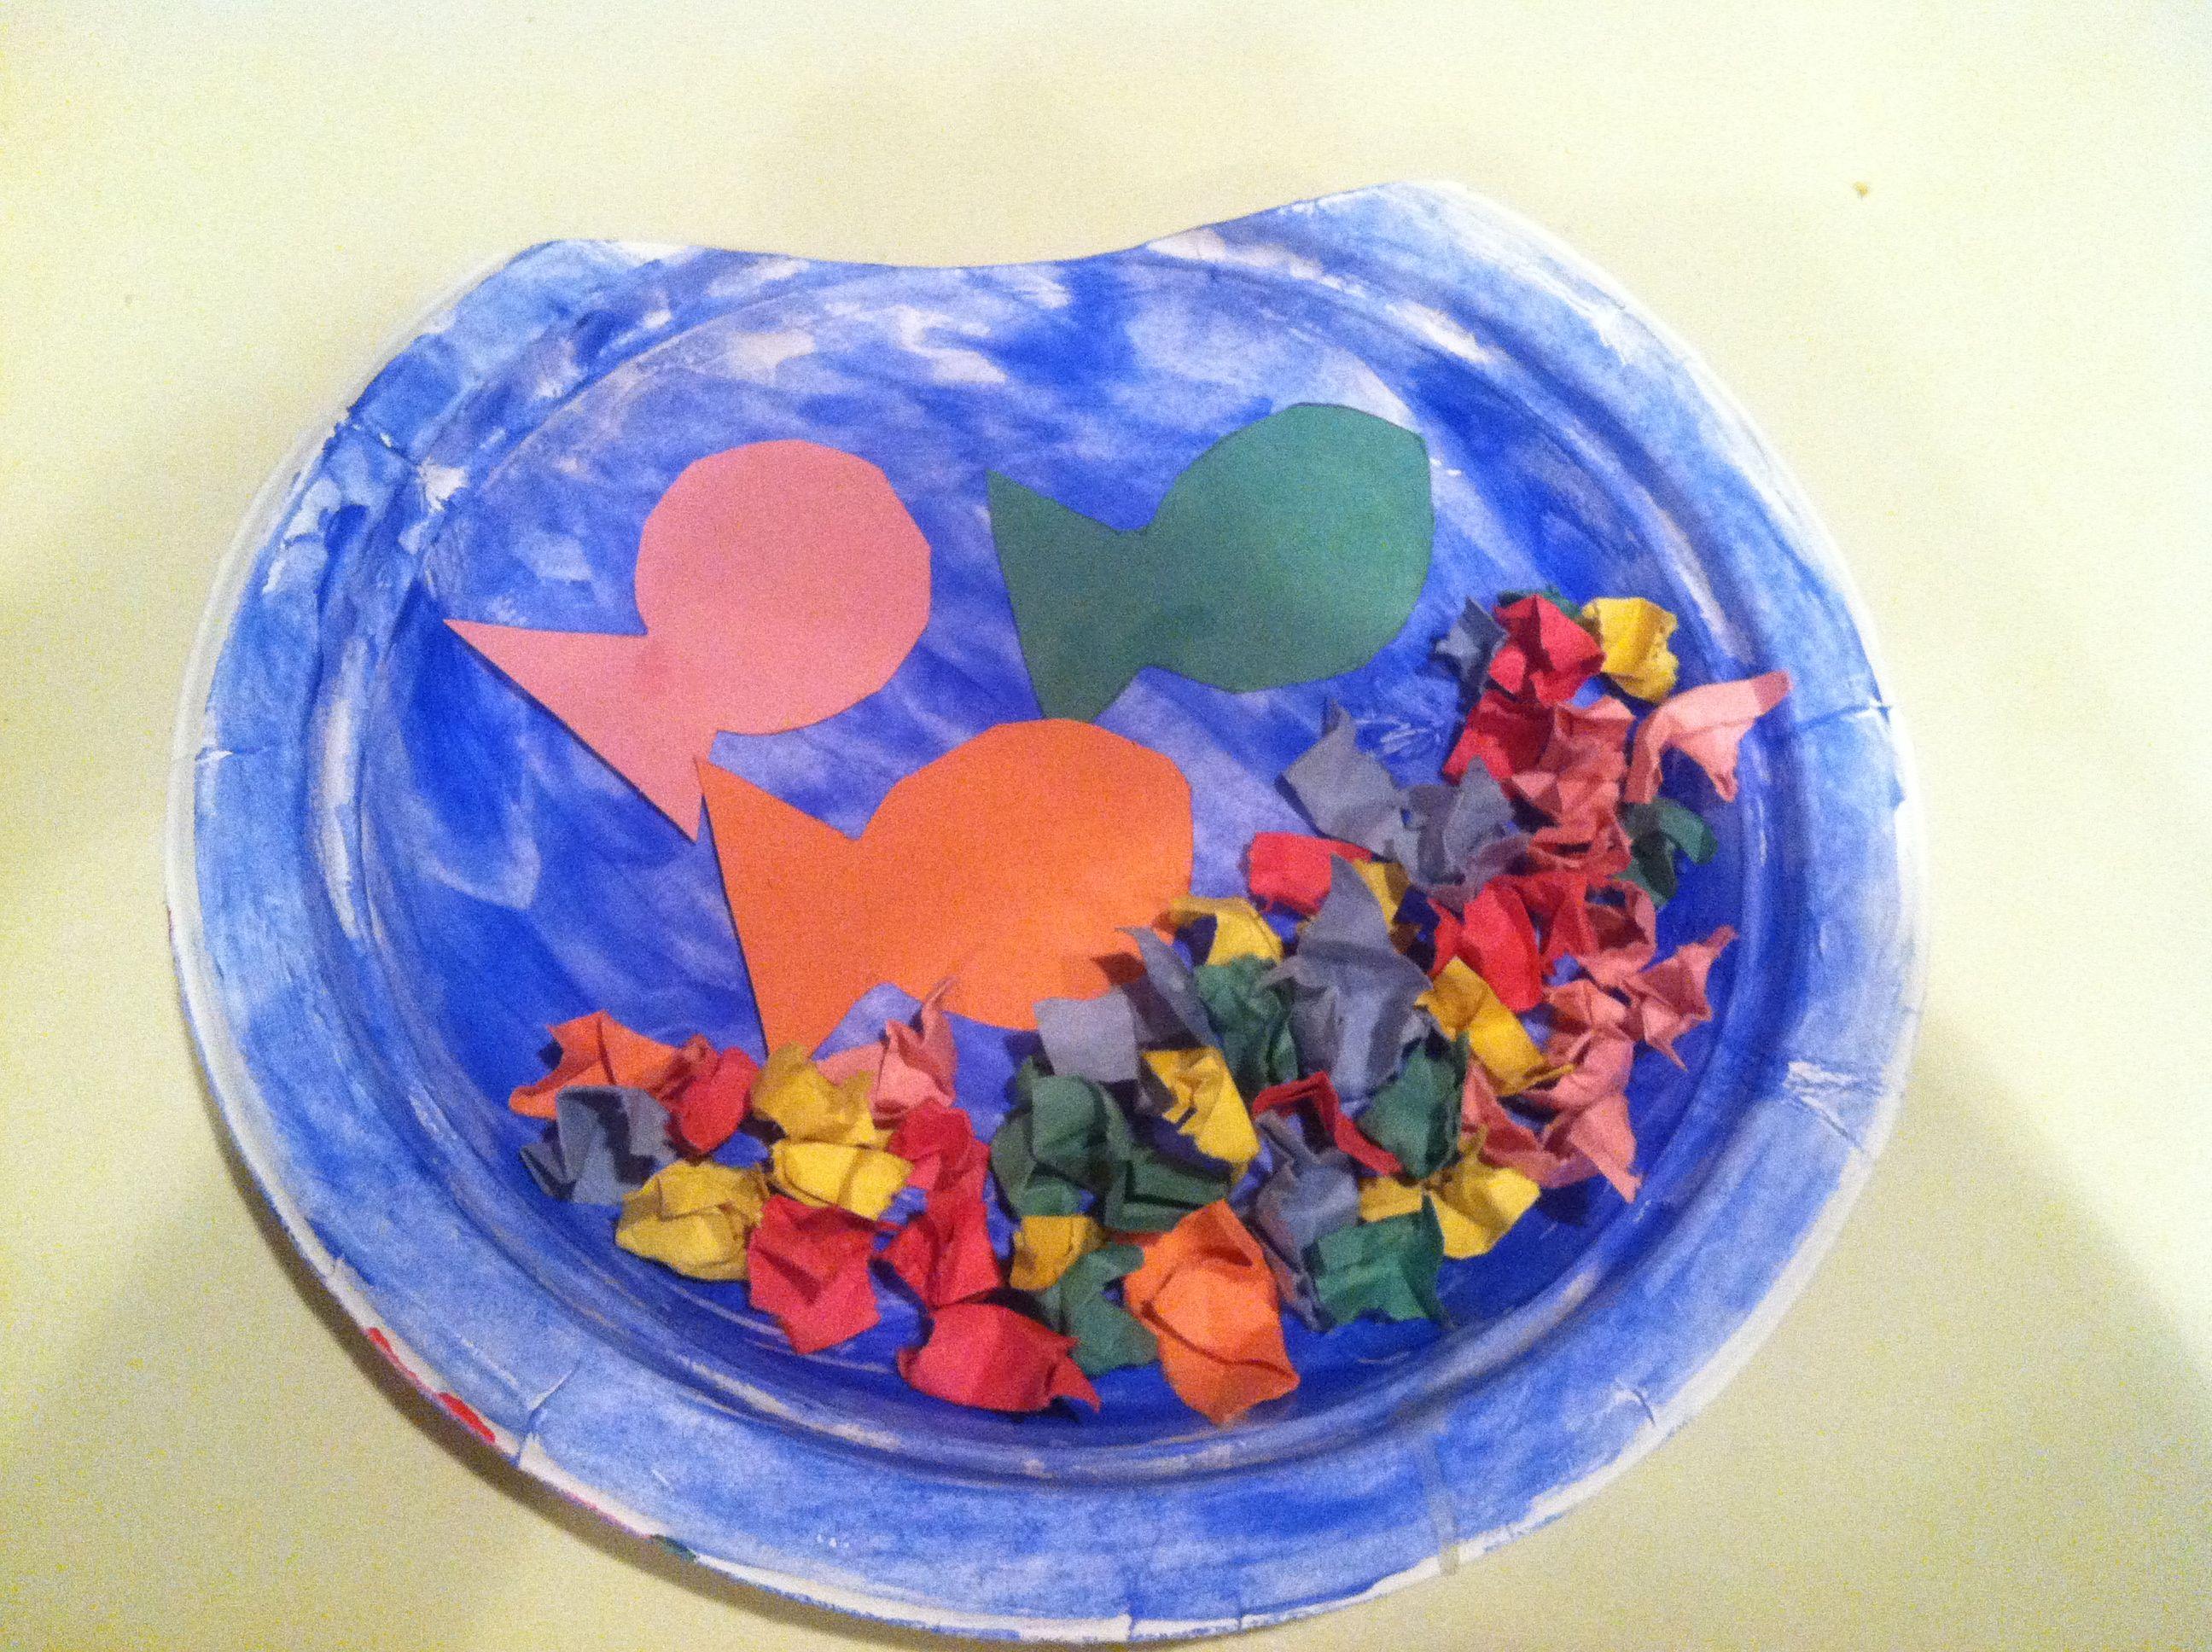 Kenzie S Paper Plate Fish Bowl